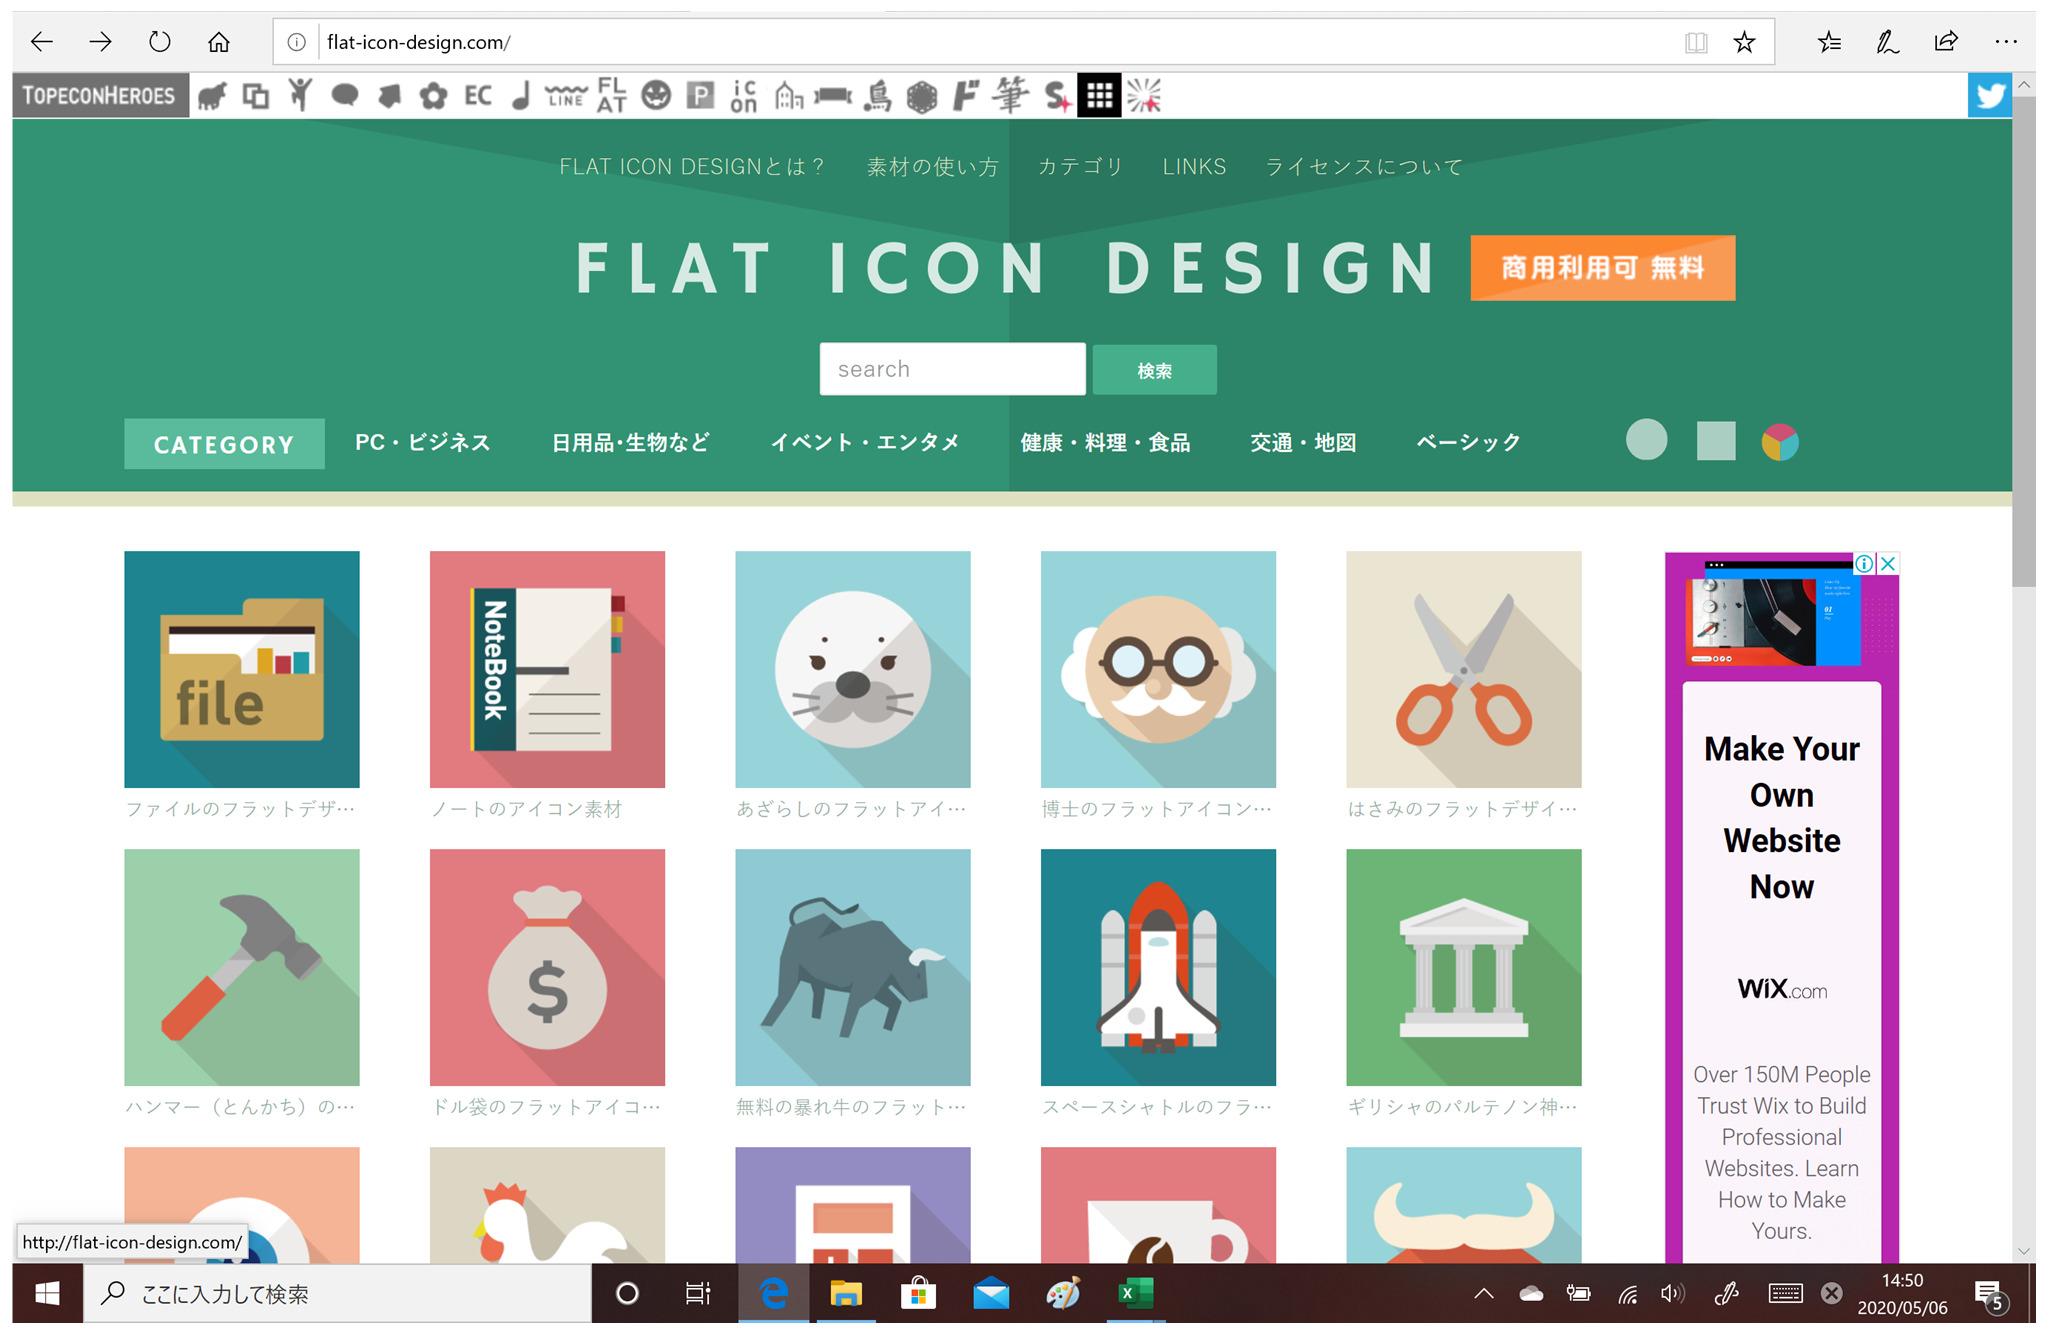 FLAT-ICON-DESIGNサイトのトップ画面